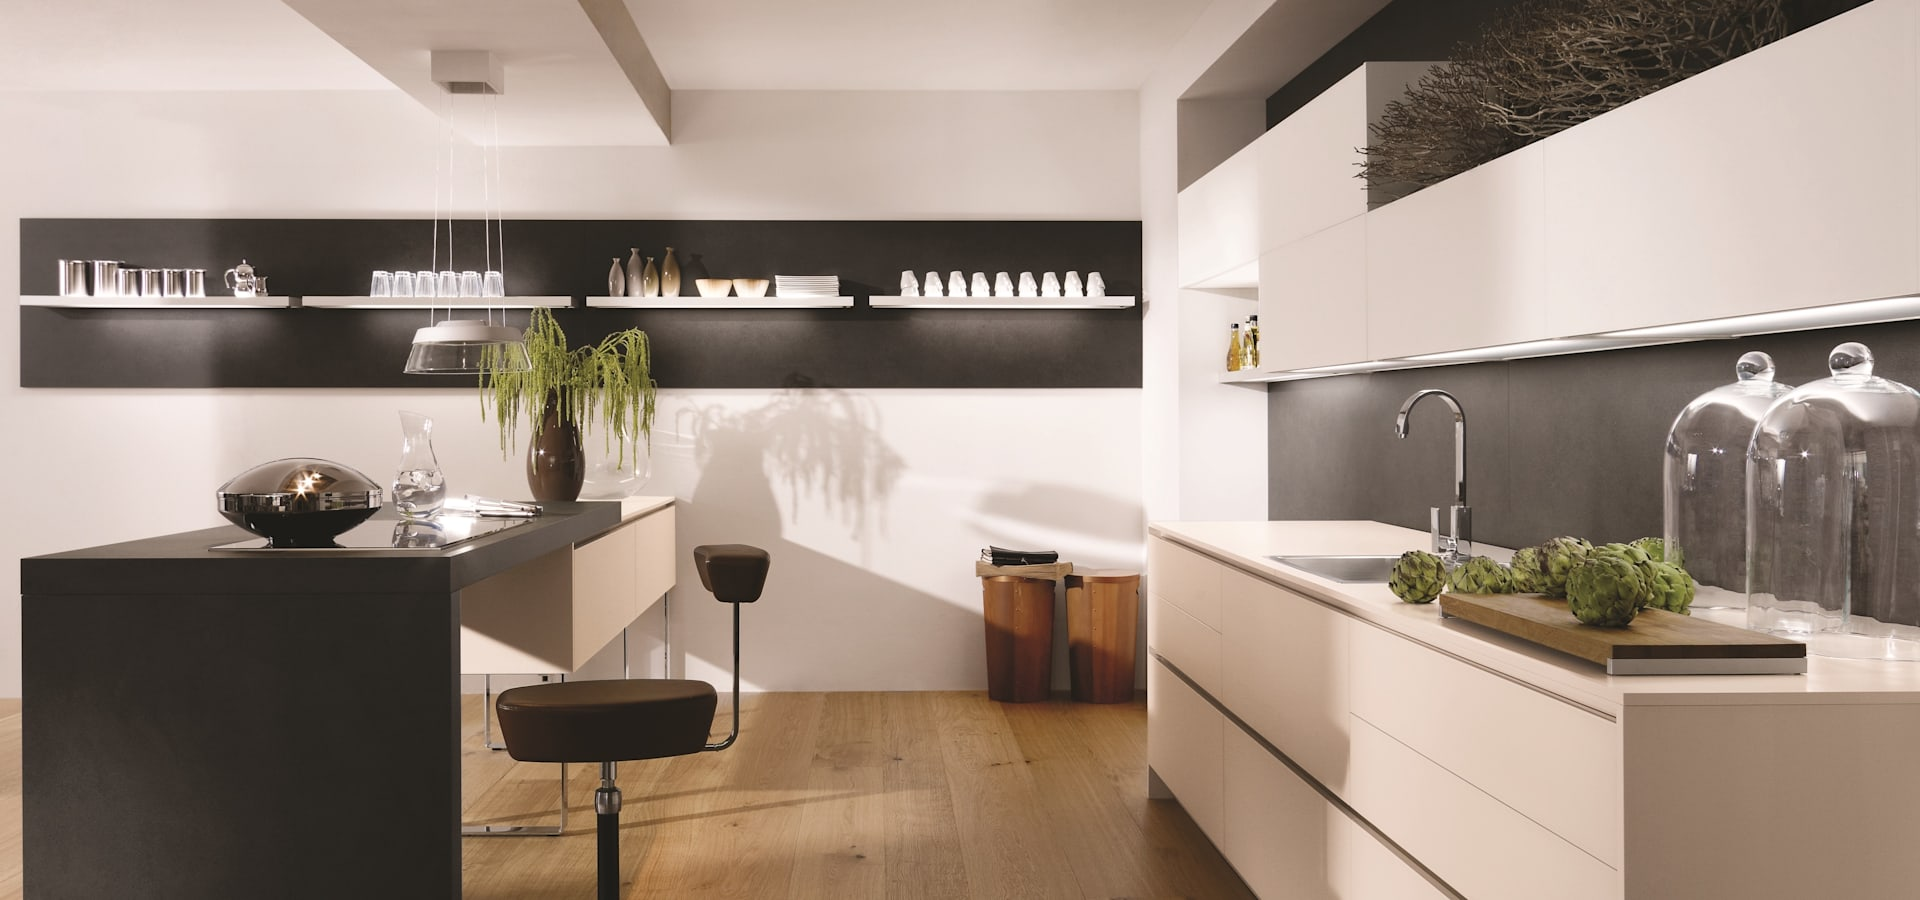 alno satina profesjonalista studio k chentraum homify. Black Bedroom Furniture Sets. Home Design Ideas